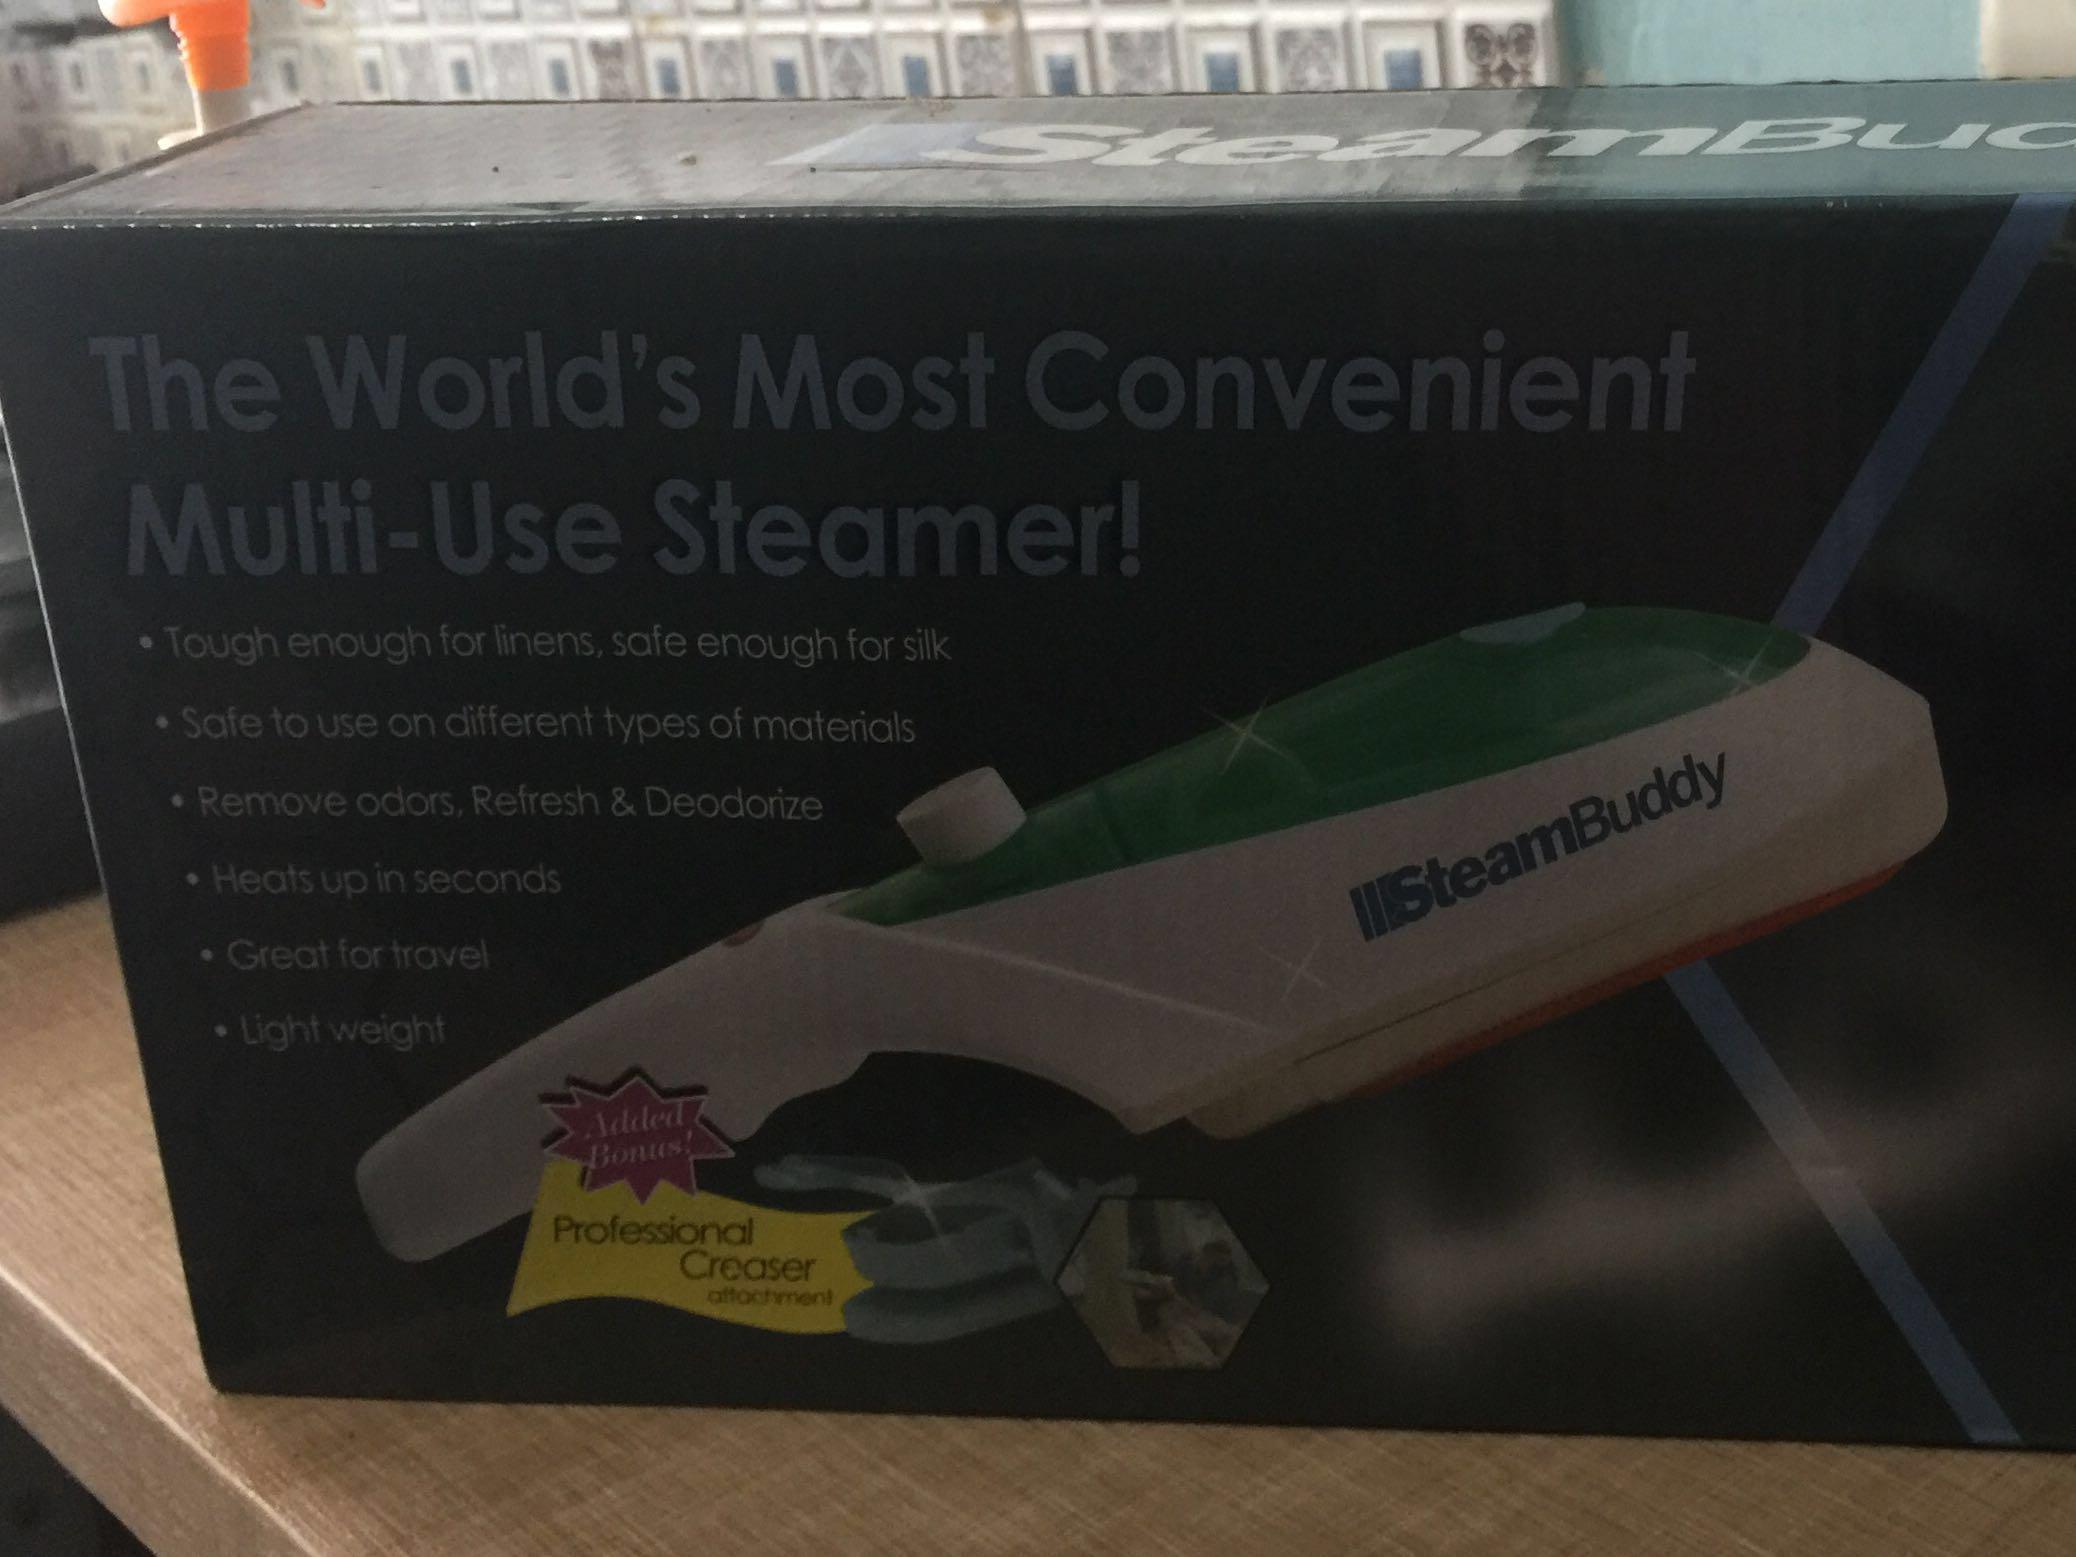 Travelling Steamer